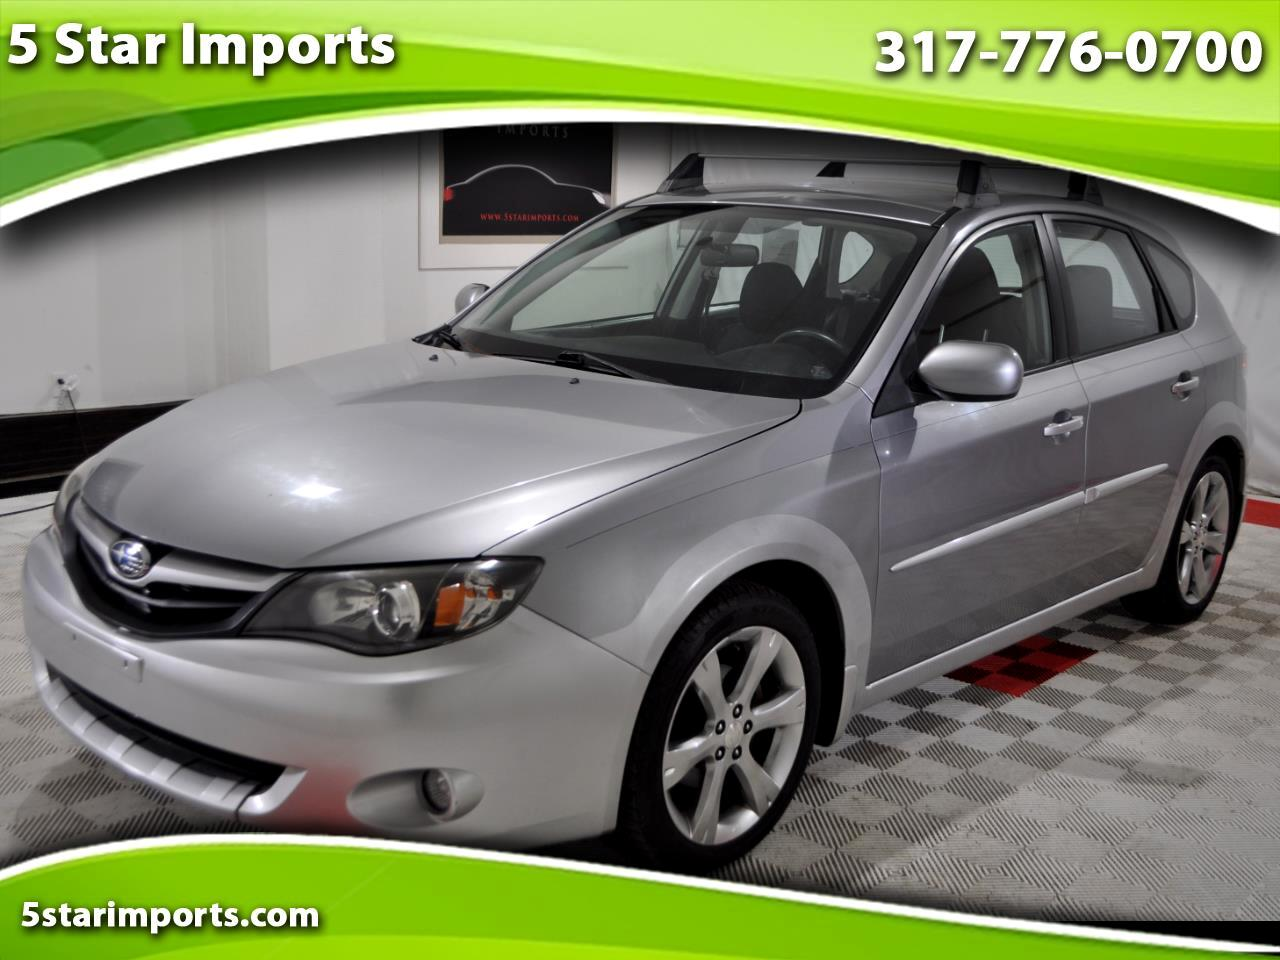 Subaru Impreza Outback Sport 2011